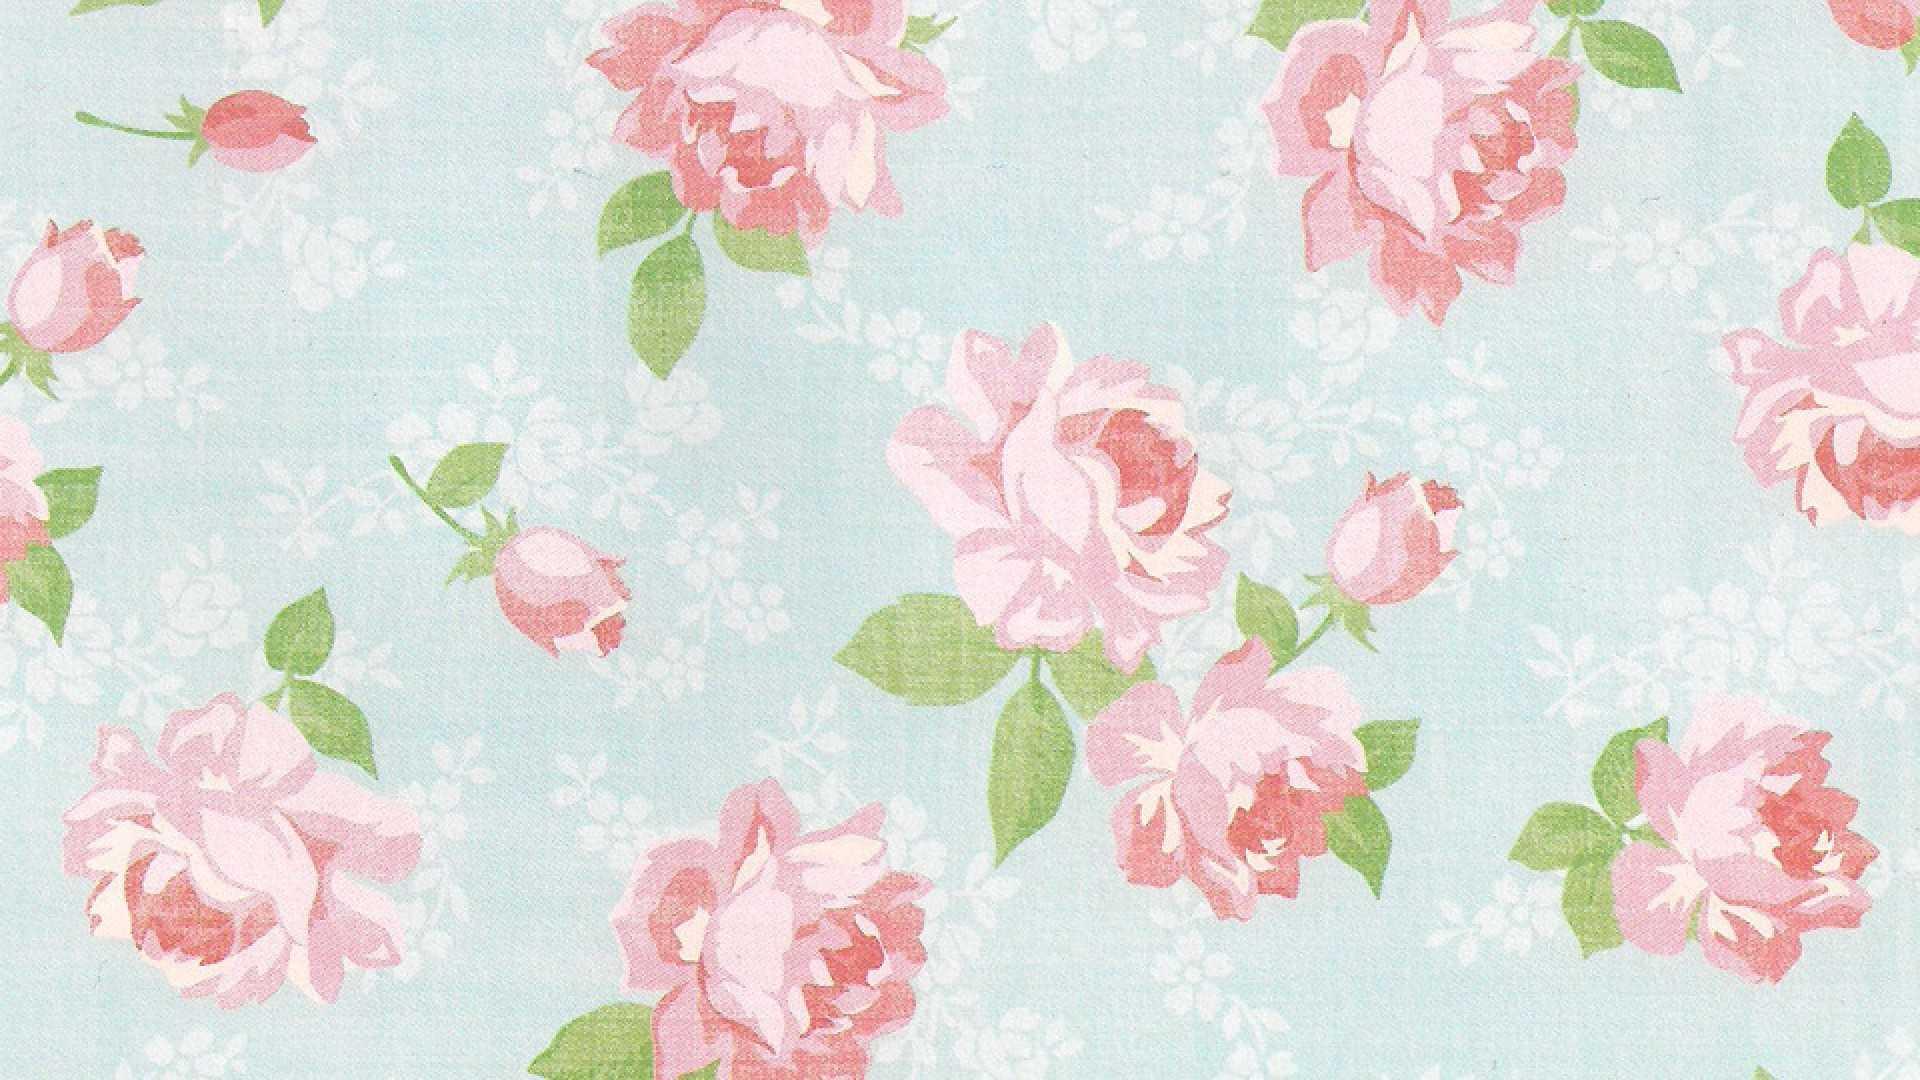 Flower Backgrounds Tumblr Wallpaper Cave